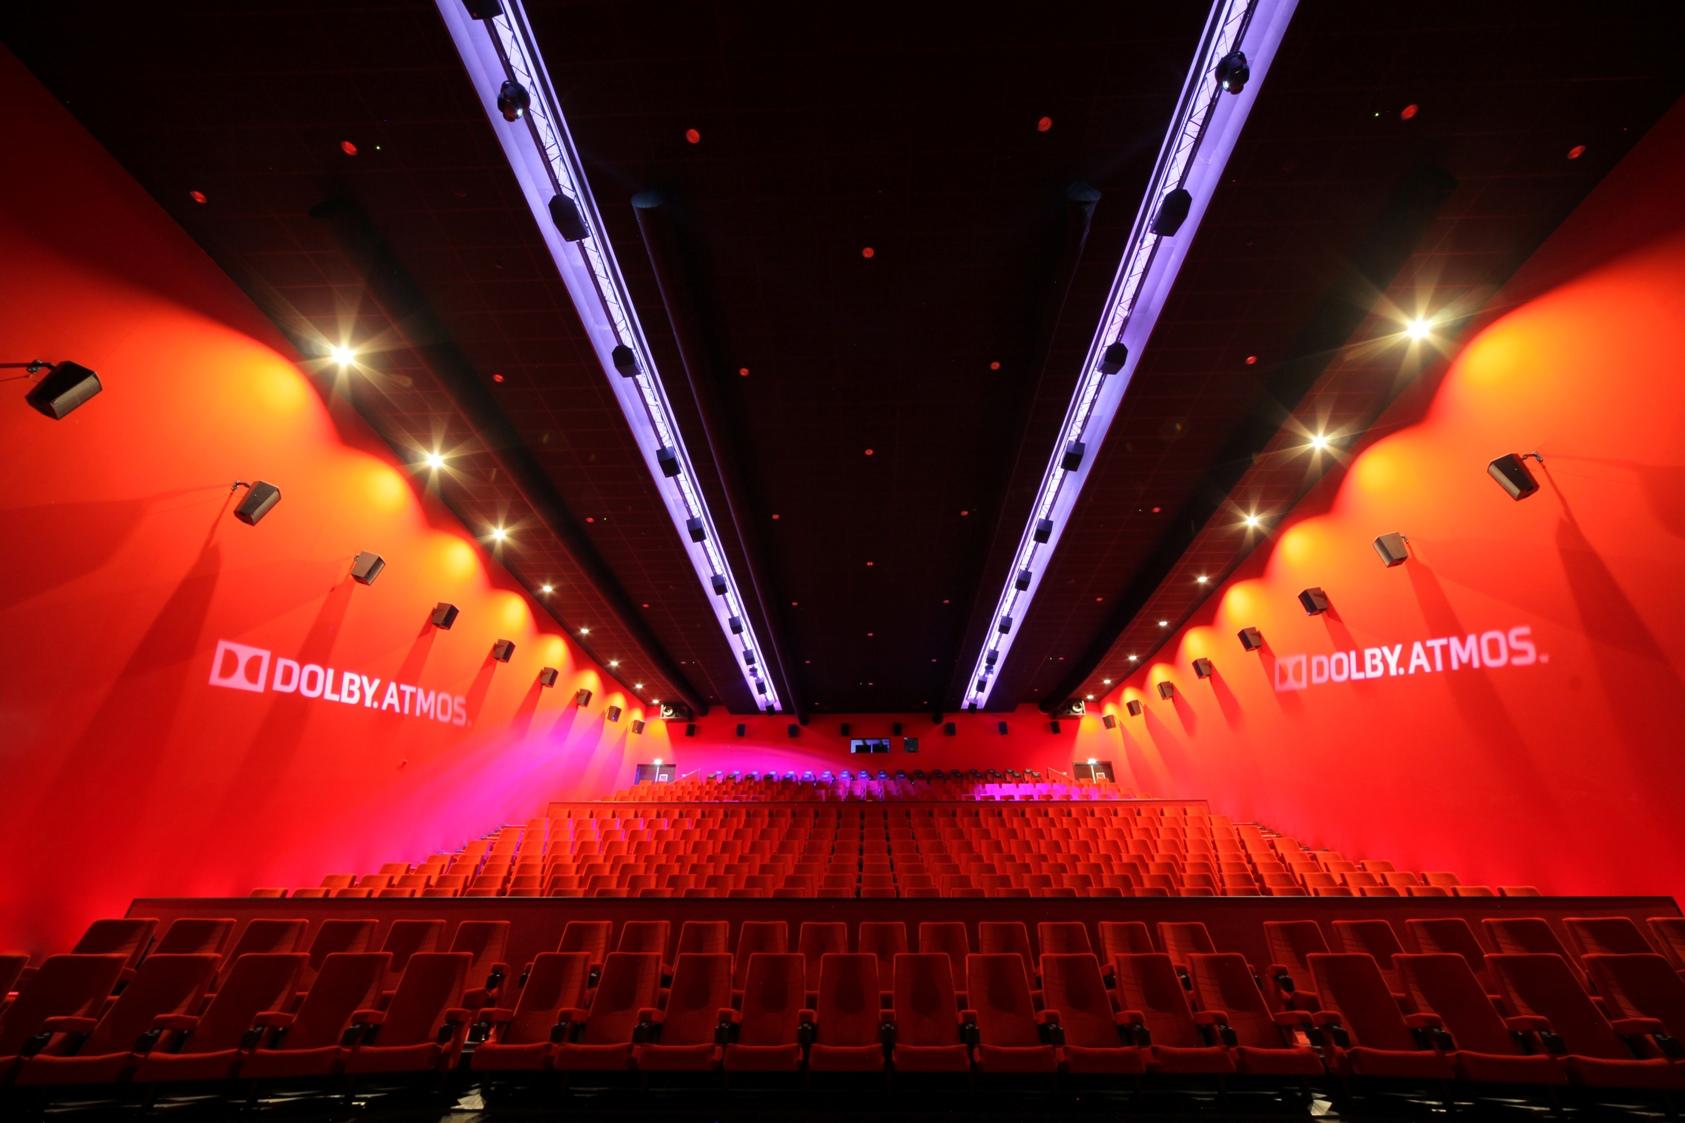 Vue Cinemas Kerkrade The Netherlands Alcons Audio -> Fotos De Cinemas